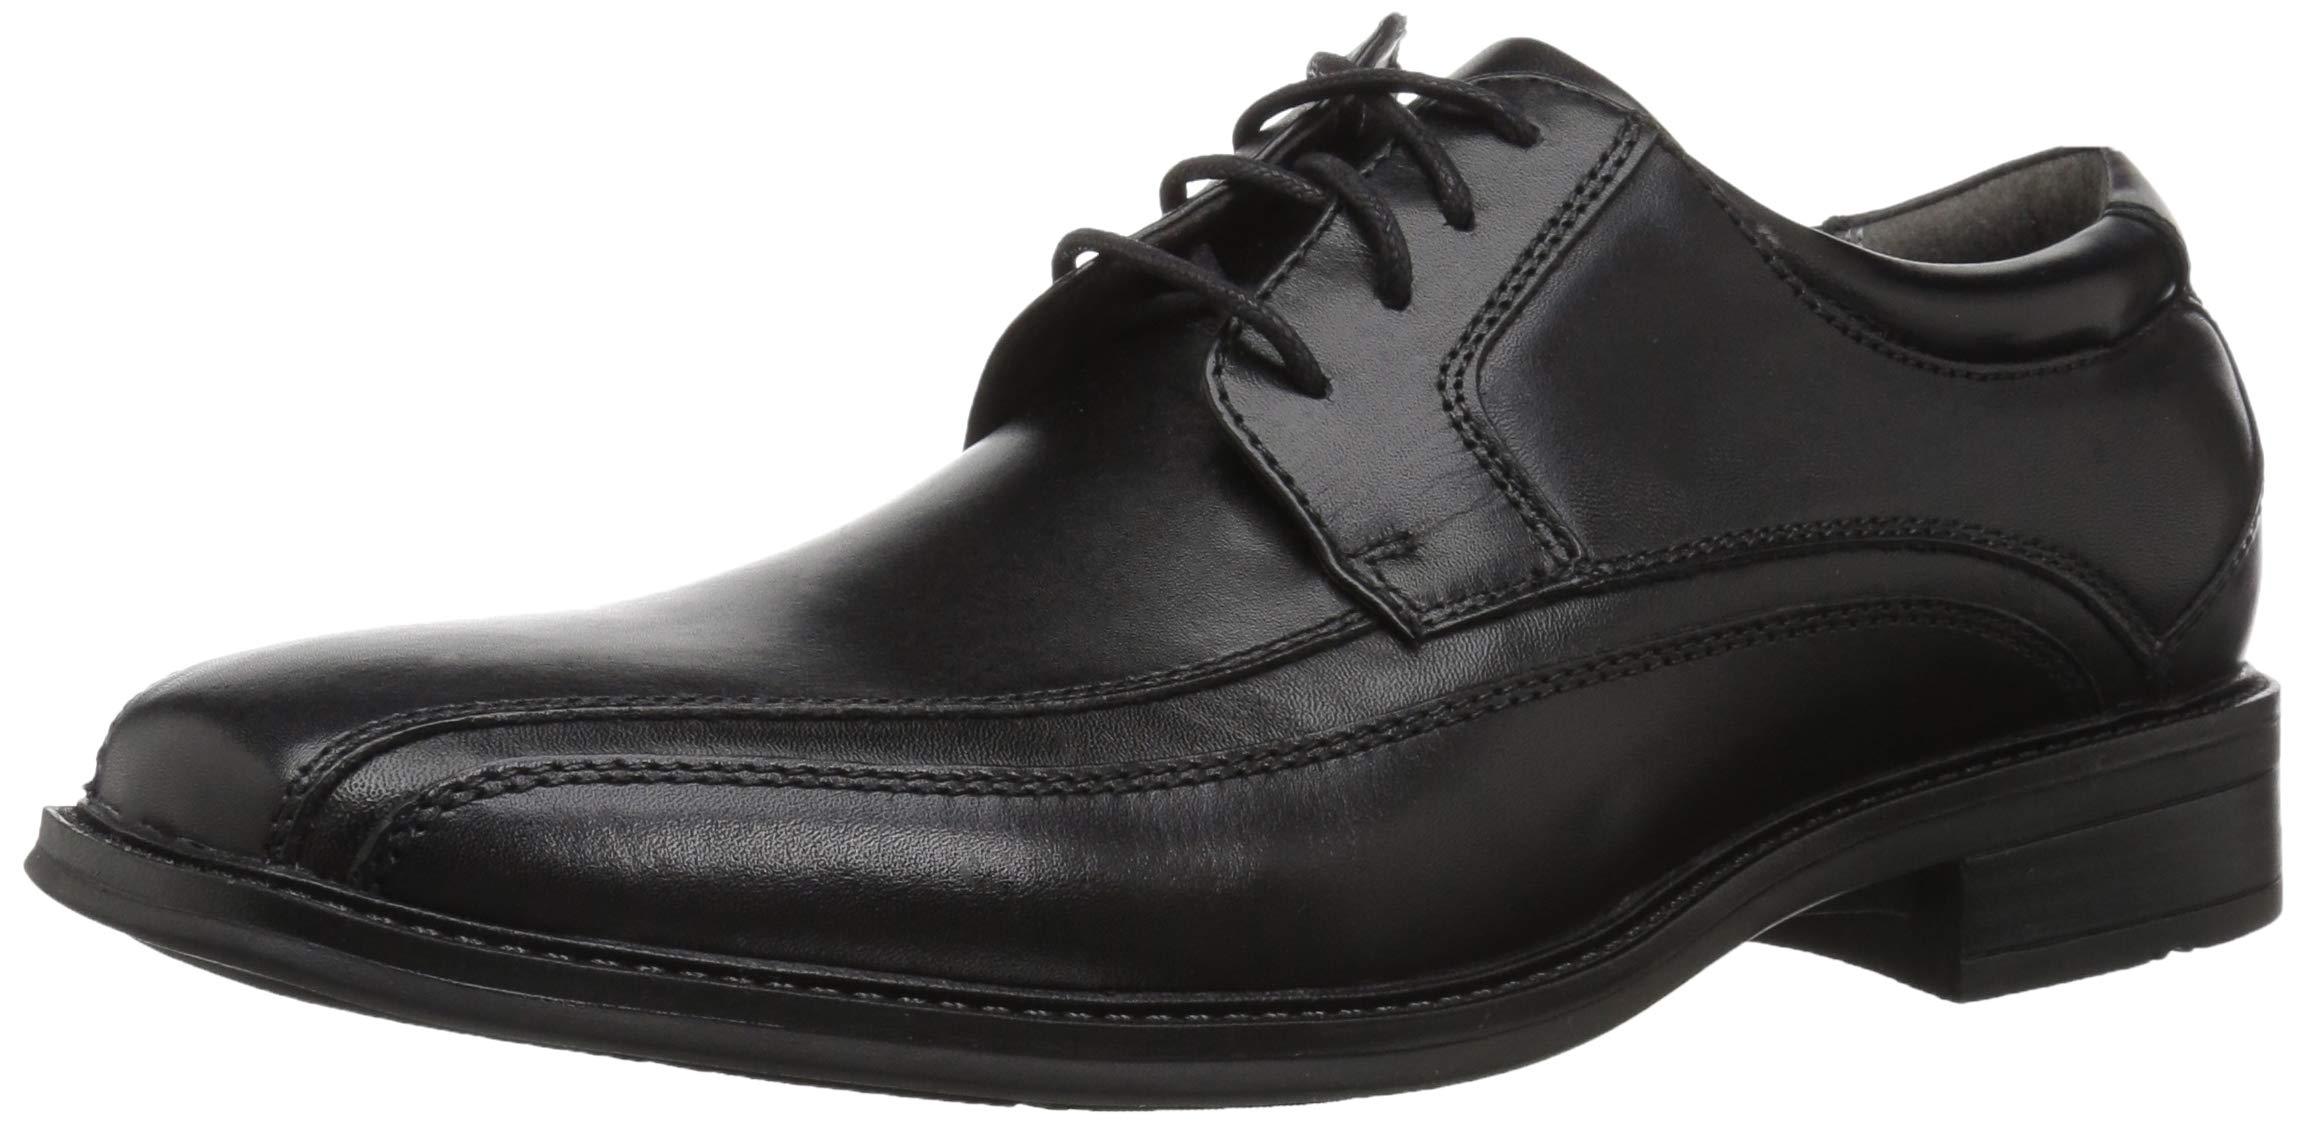 Dockers Men's Endow Leather Oxford Dress Shoe,Black,12 M US